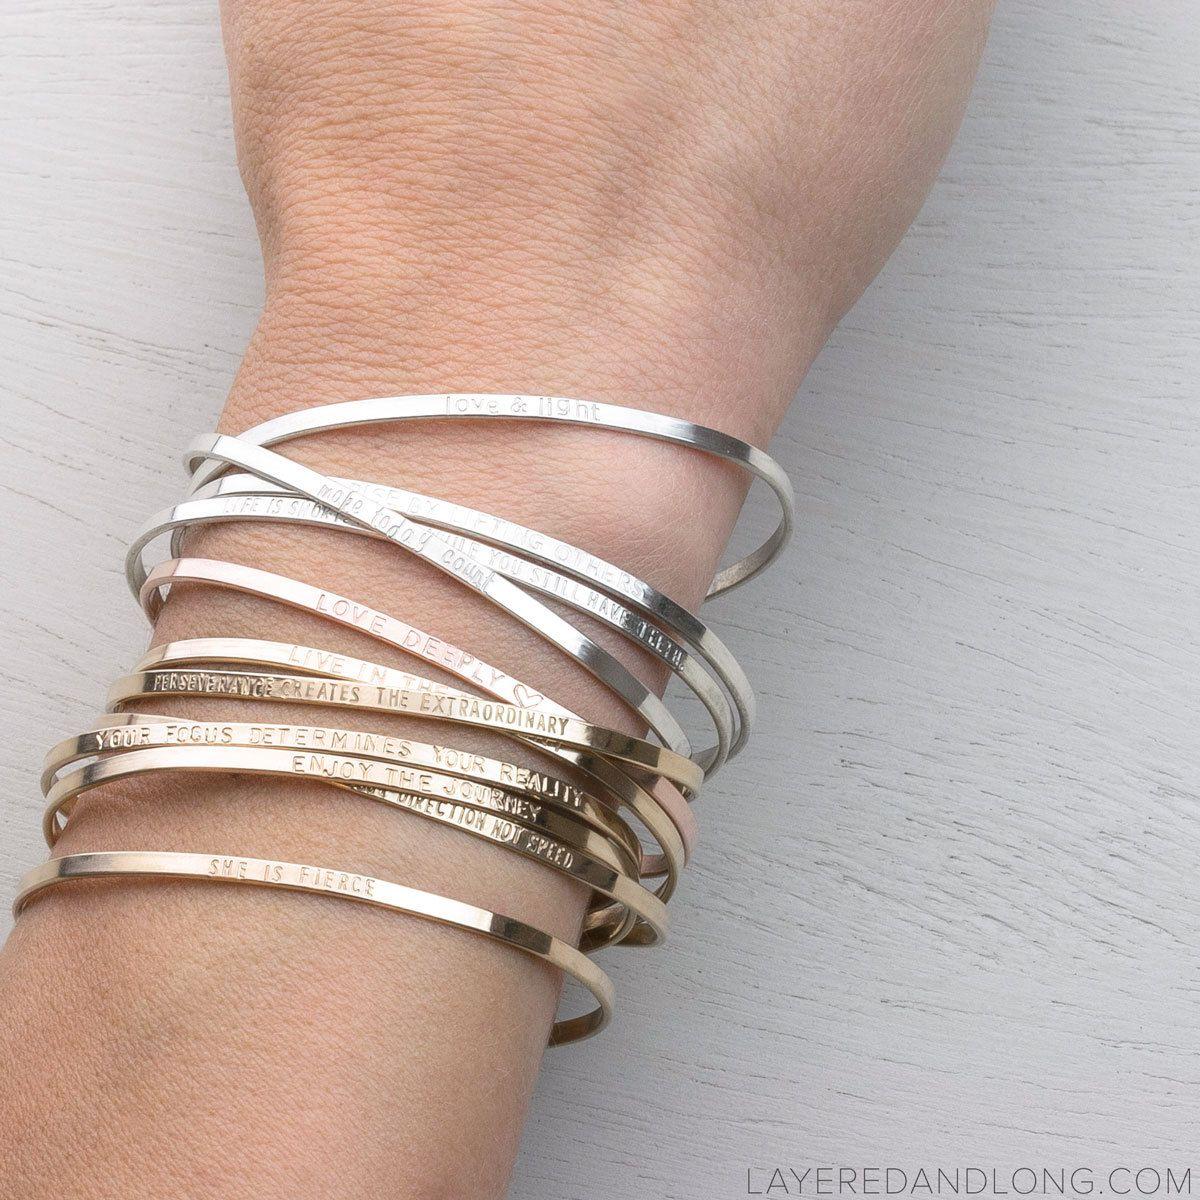 Personalized Cuff Bracelet Inspirational By Layeredandlong On Etsy